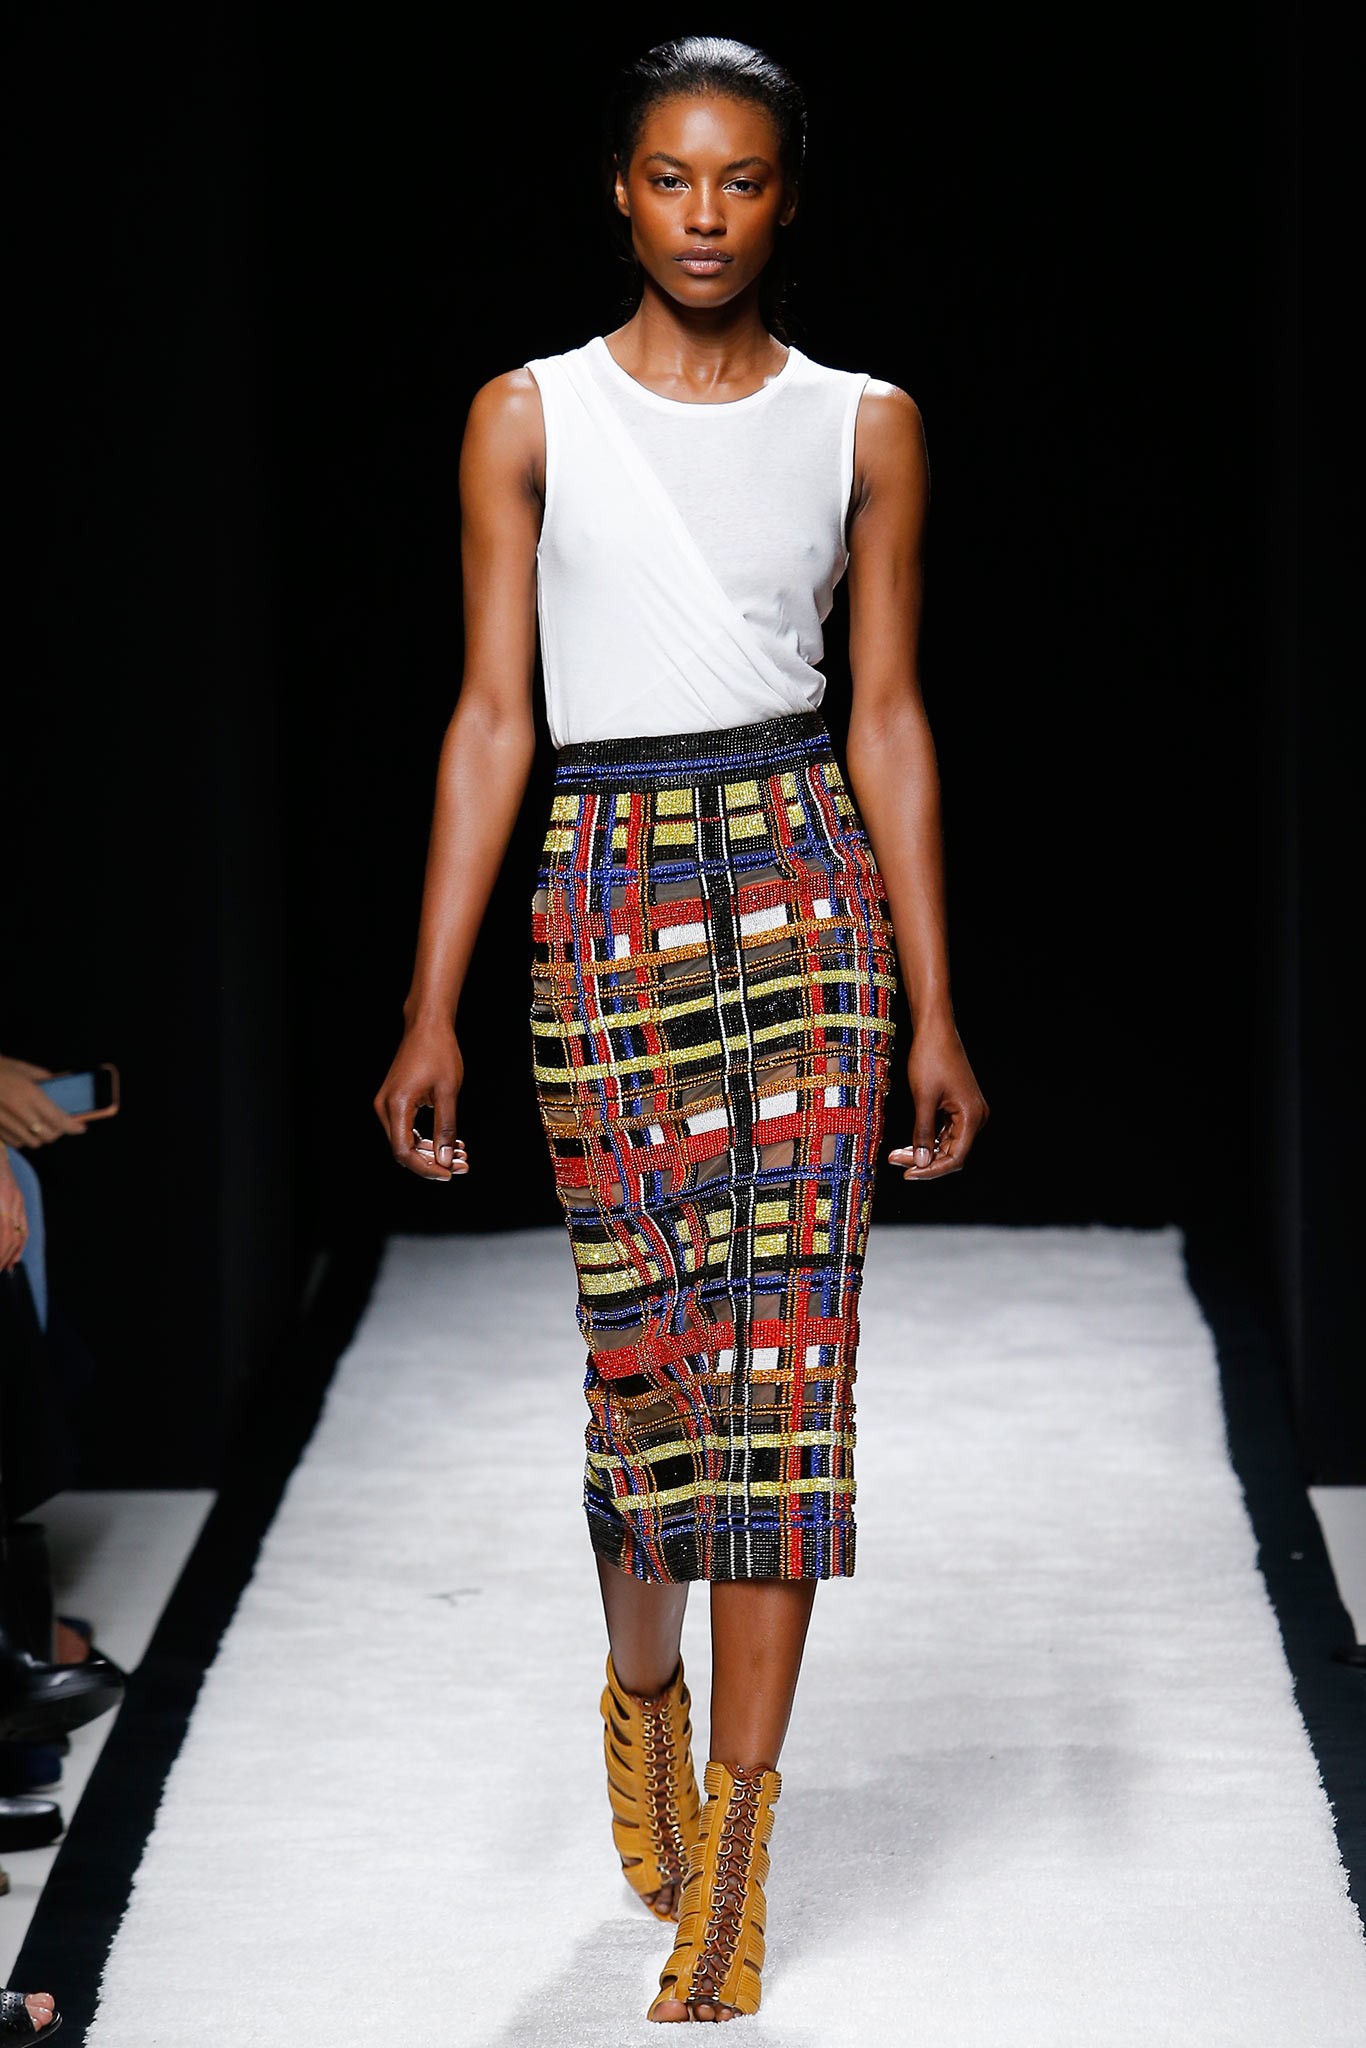 Fashion De Moda: In The Thick Of Style